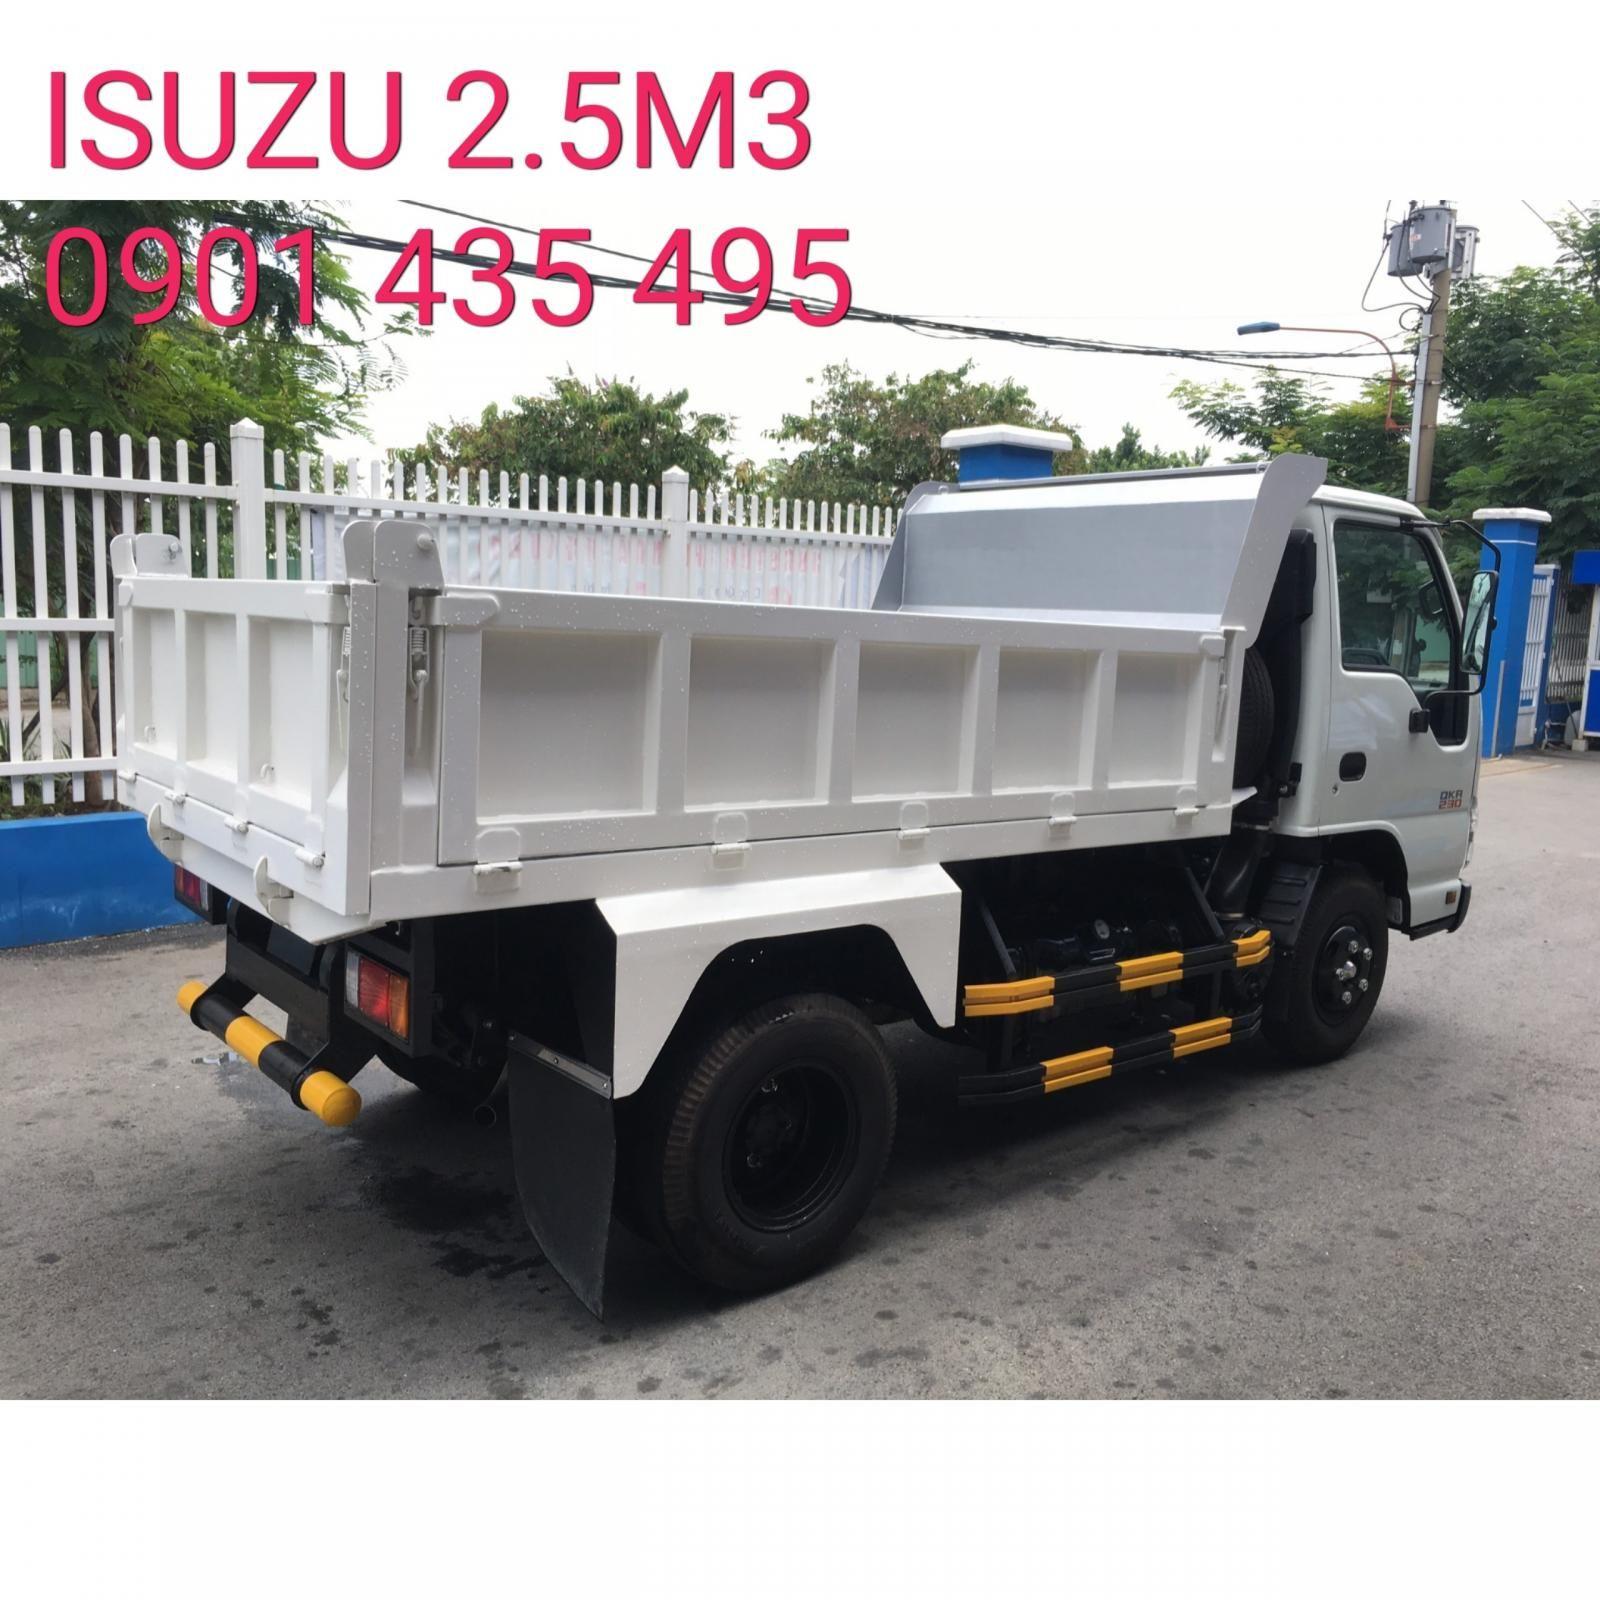 Isuzu thùng ben 2.5M3 KM, 12 phiếu bảo dưỡng, radio MP3